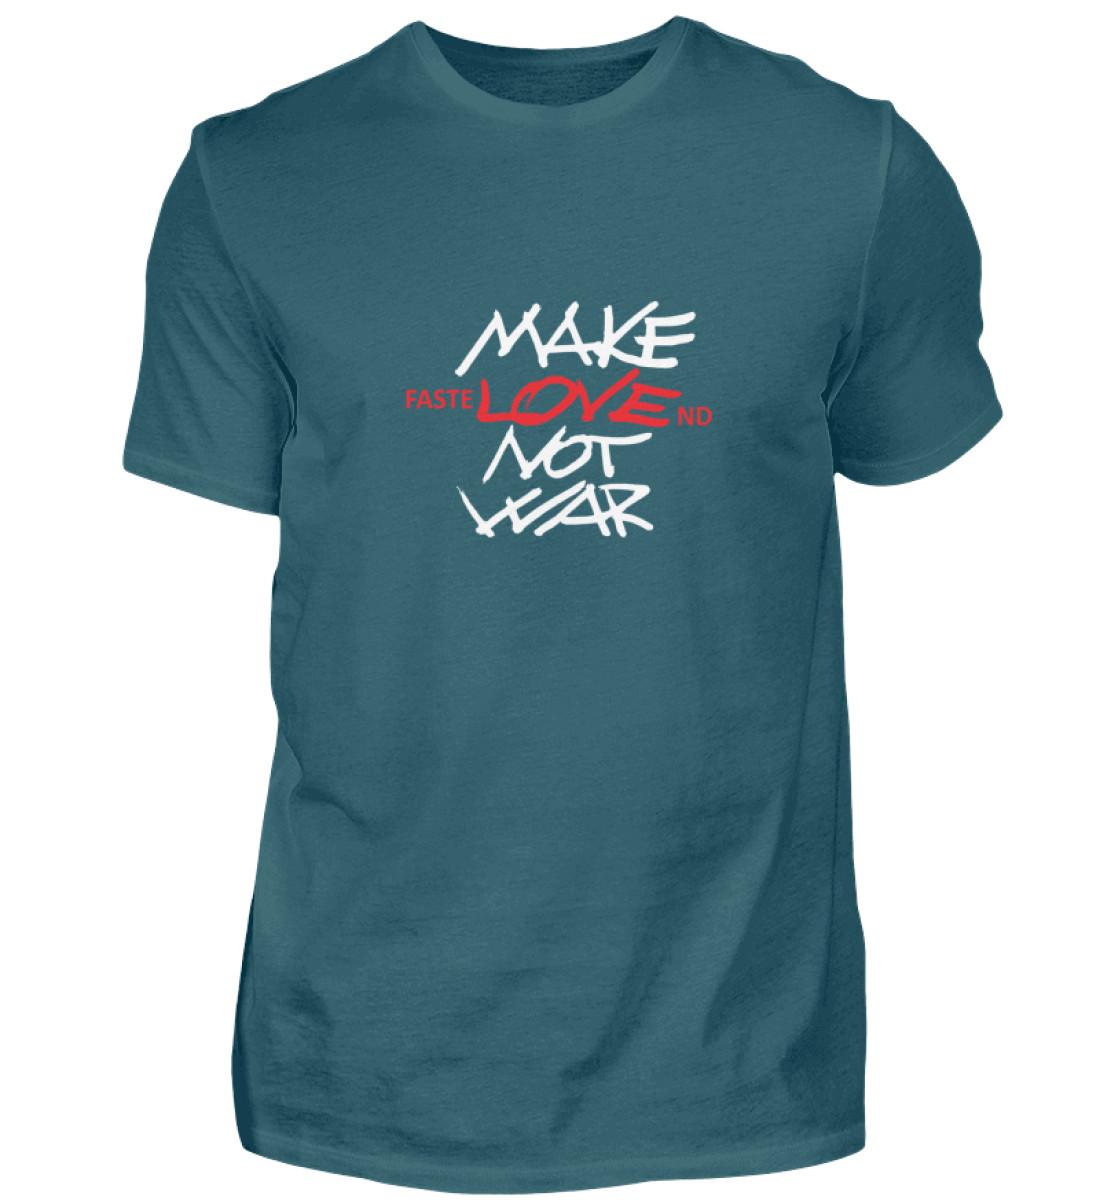 FasteLOVEnd Herren T-Shirt - Herren Shirt-1096